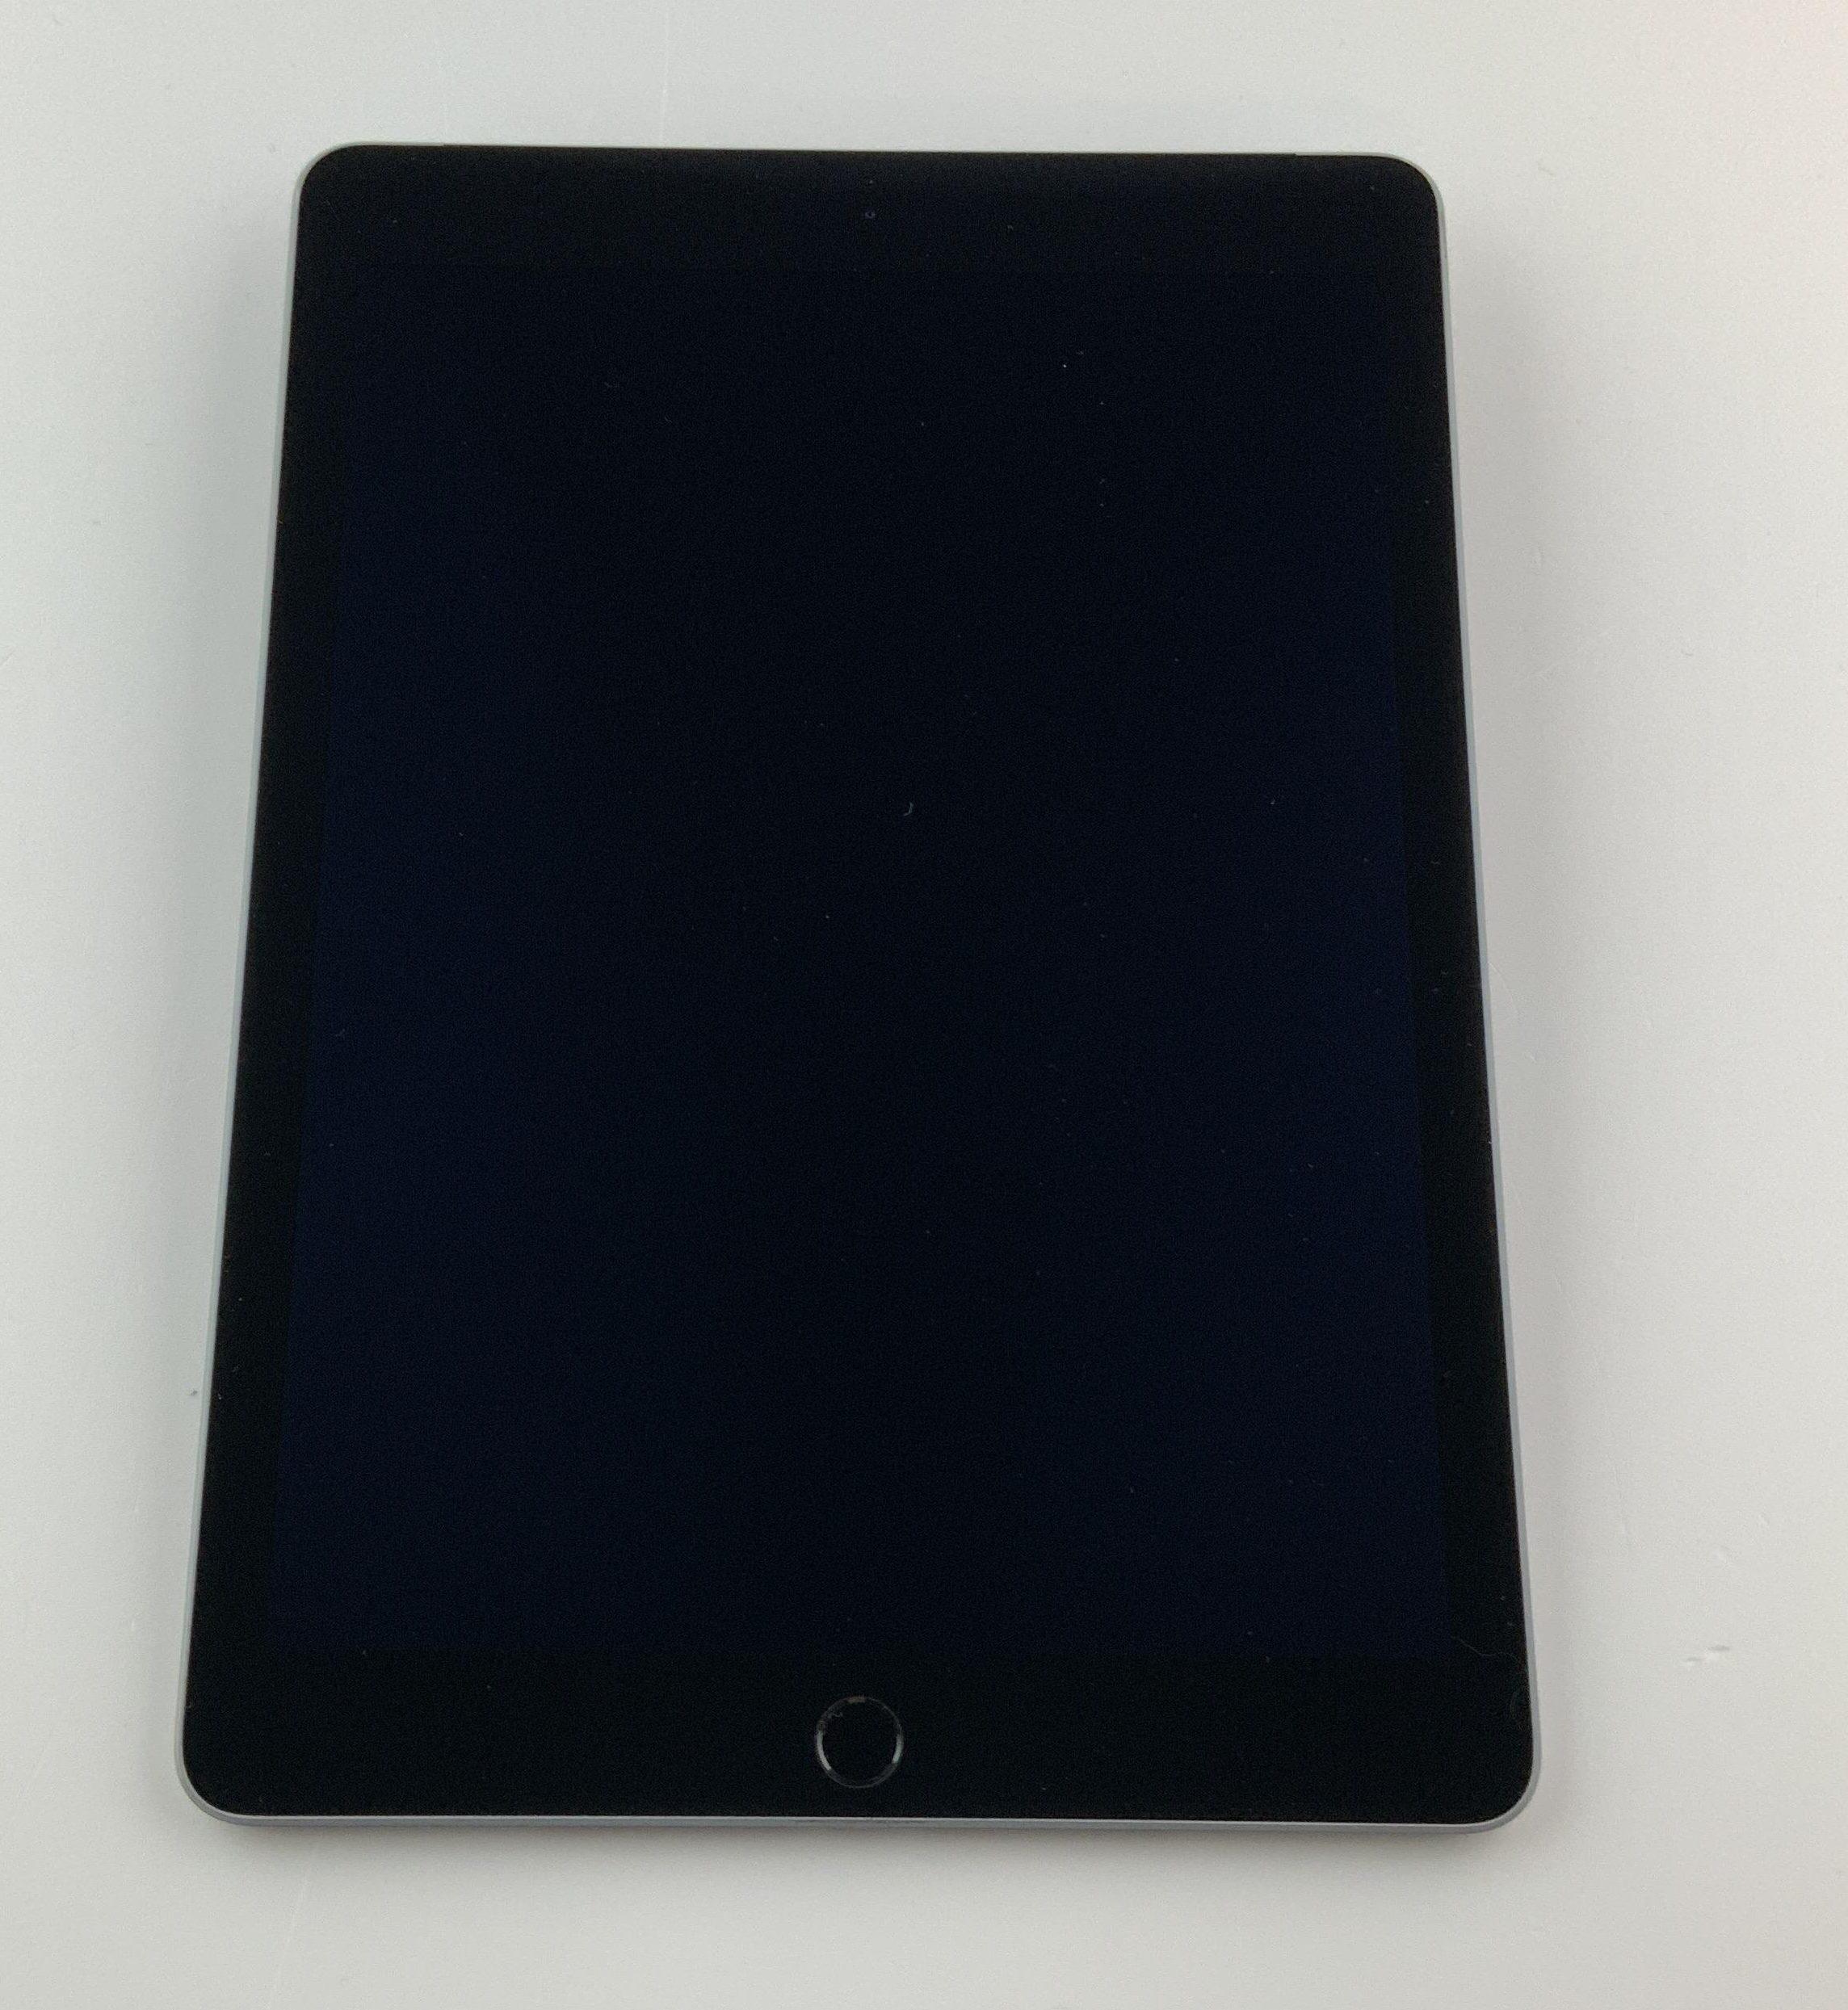 iPad Air 2 Wi-Fi + Cellular 64GB, 64GB, Space Gray, Kuva 1